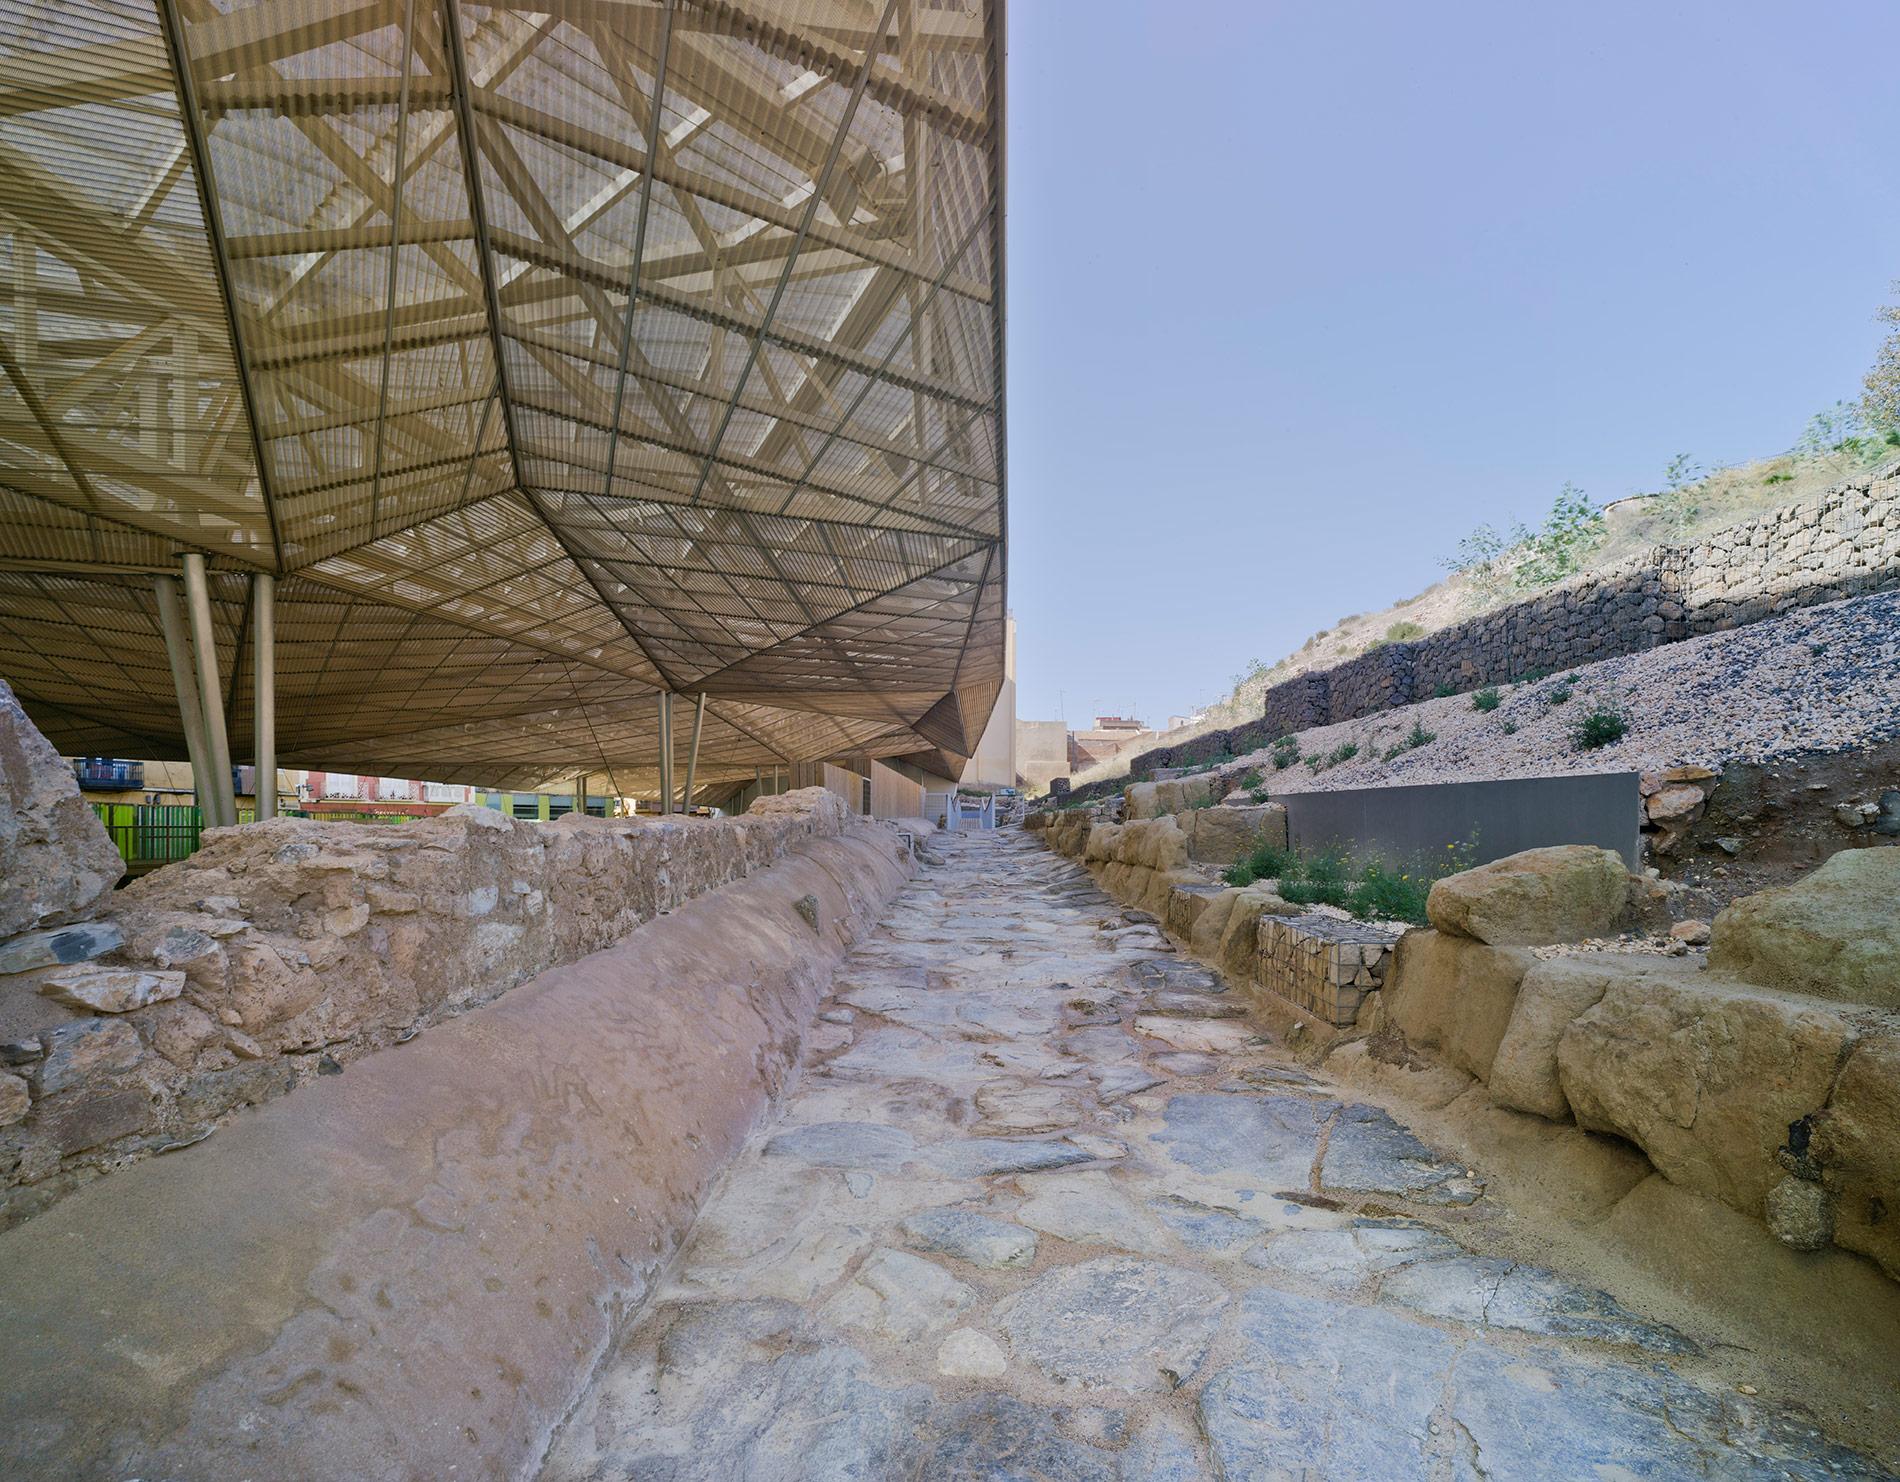 Barrio romano del Molinete - Cartagena - Decumano I